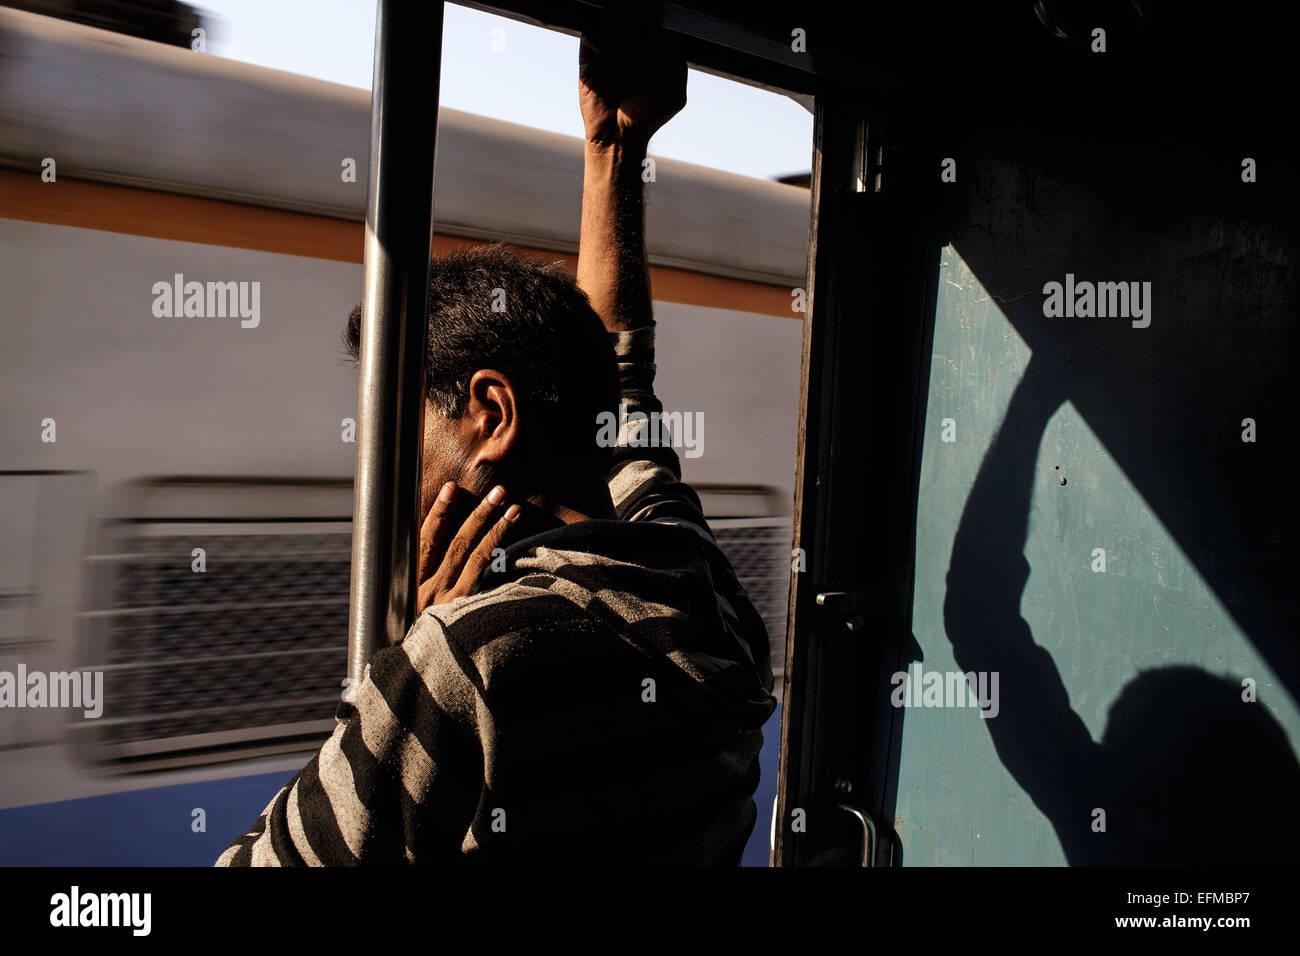 A man commutes on a suburban train in Mumbai, India Stock Photo